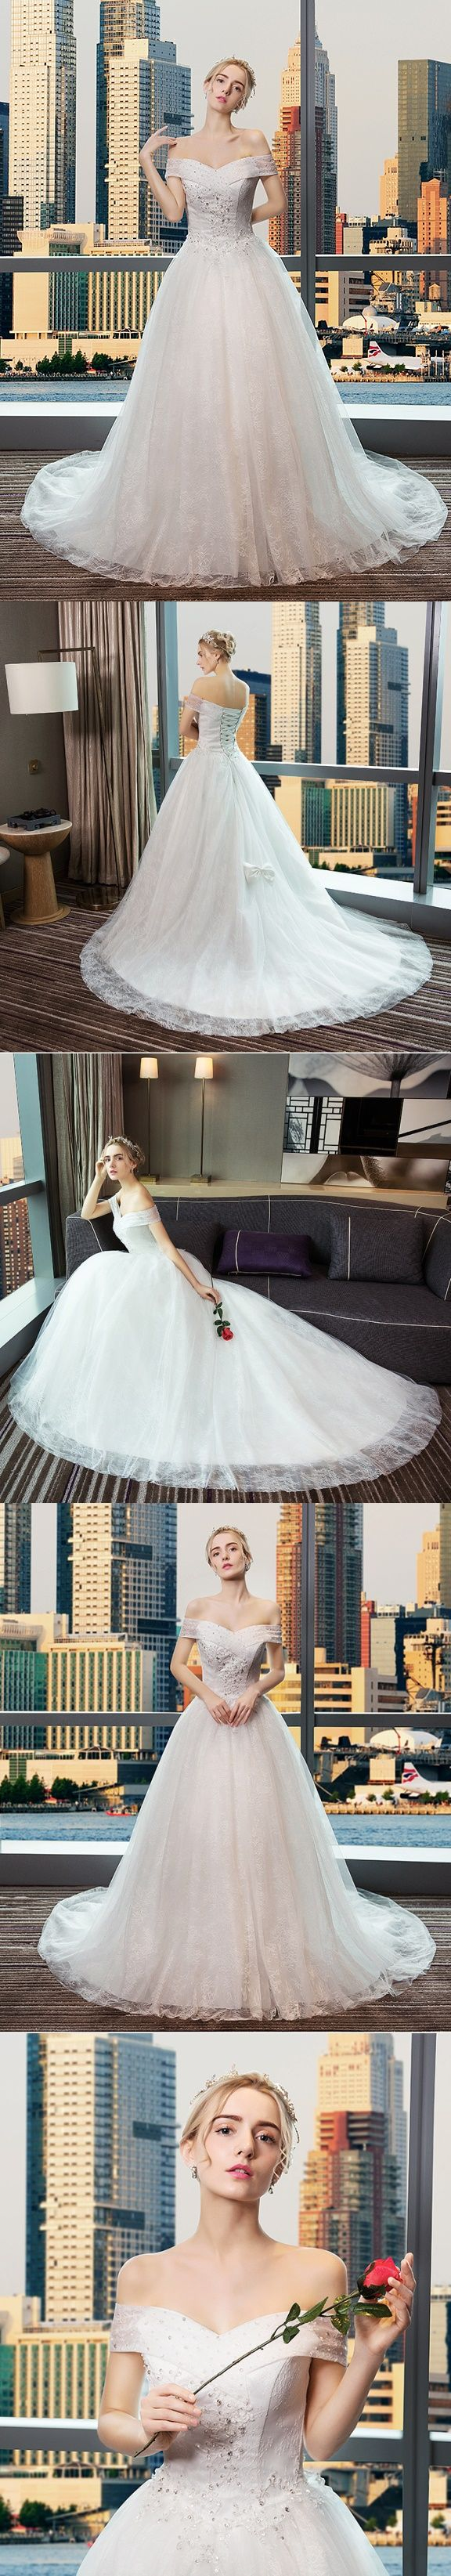 35789 best YES I DO ♧ images on Pinterest | Wedding frocks, Short ...